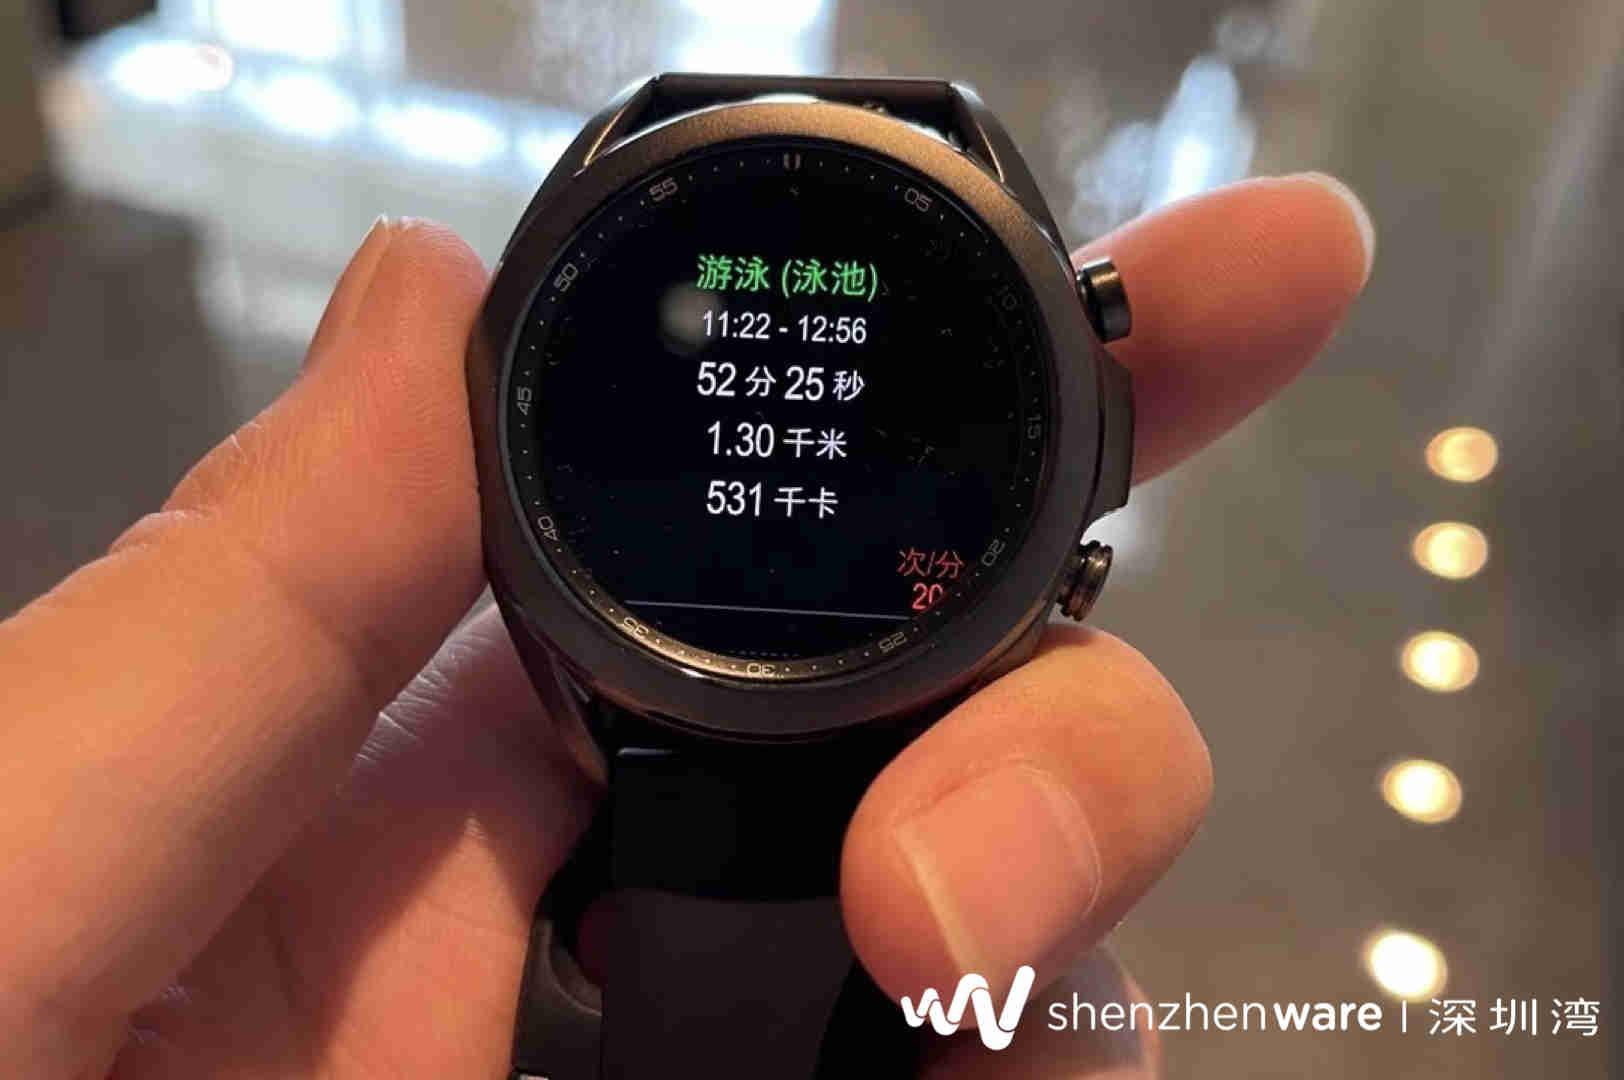 shenzhenware_report_image_3x2_2021